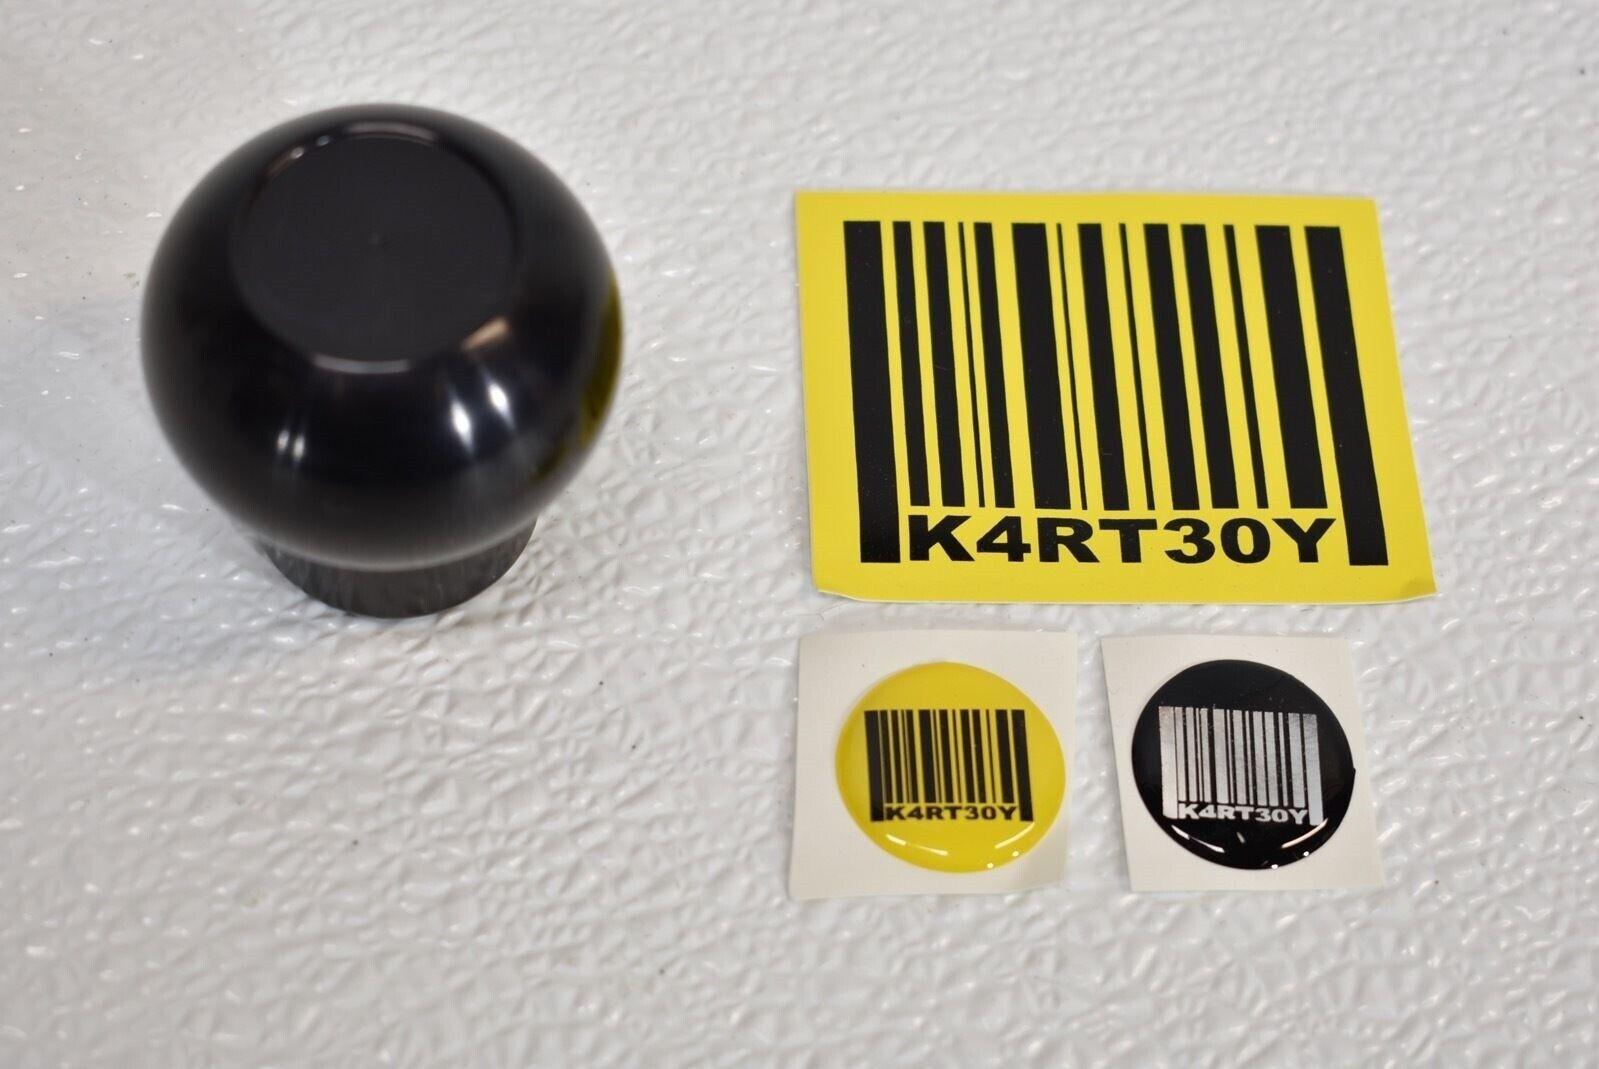 Black SALE Kartboy Aluminum Shift Knob Knuckle Ball for Impreza //WRX //BRZ //FRS